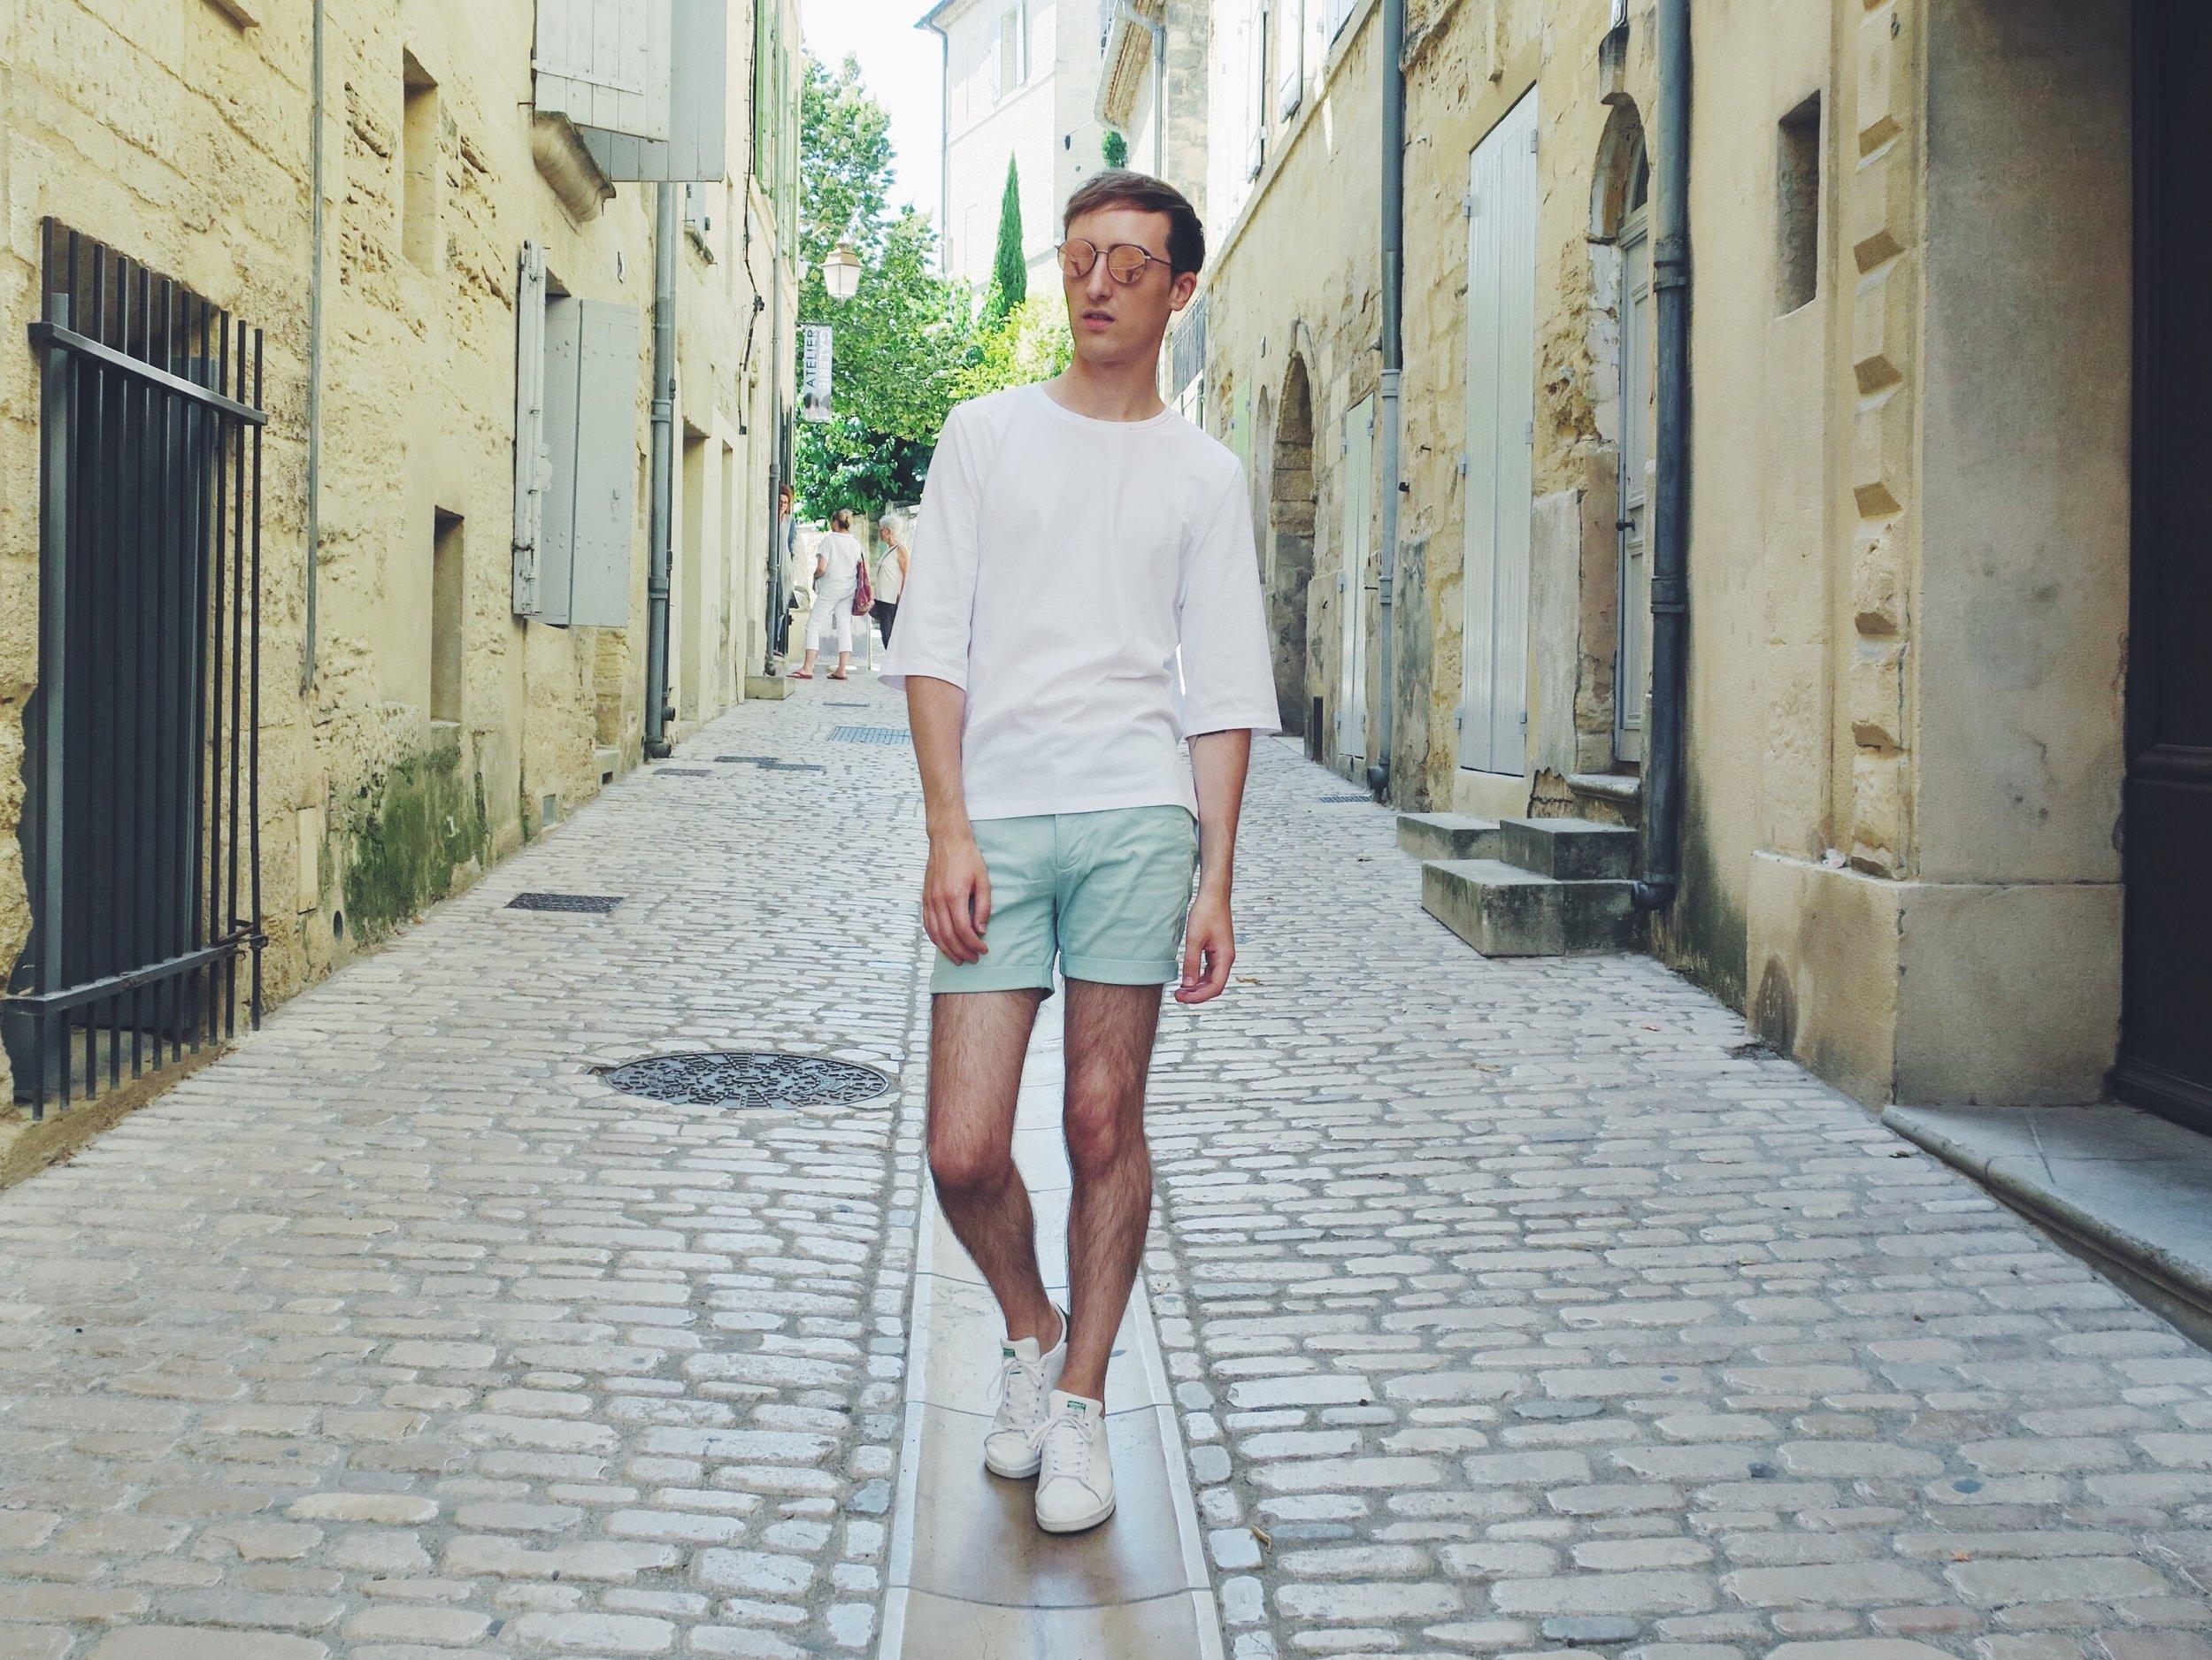 Thomas Dekens t-shirt from Vêtu (Rue Léon Lepage 12, Brussels) - H&M shorts - Adidas Stan Smith sneakers - Komono sunglasses